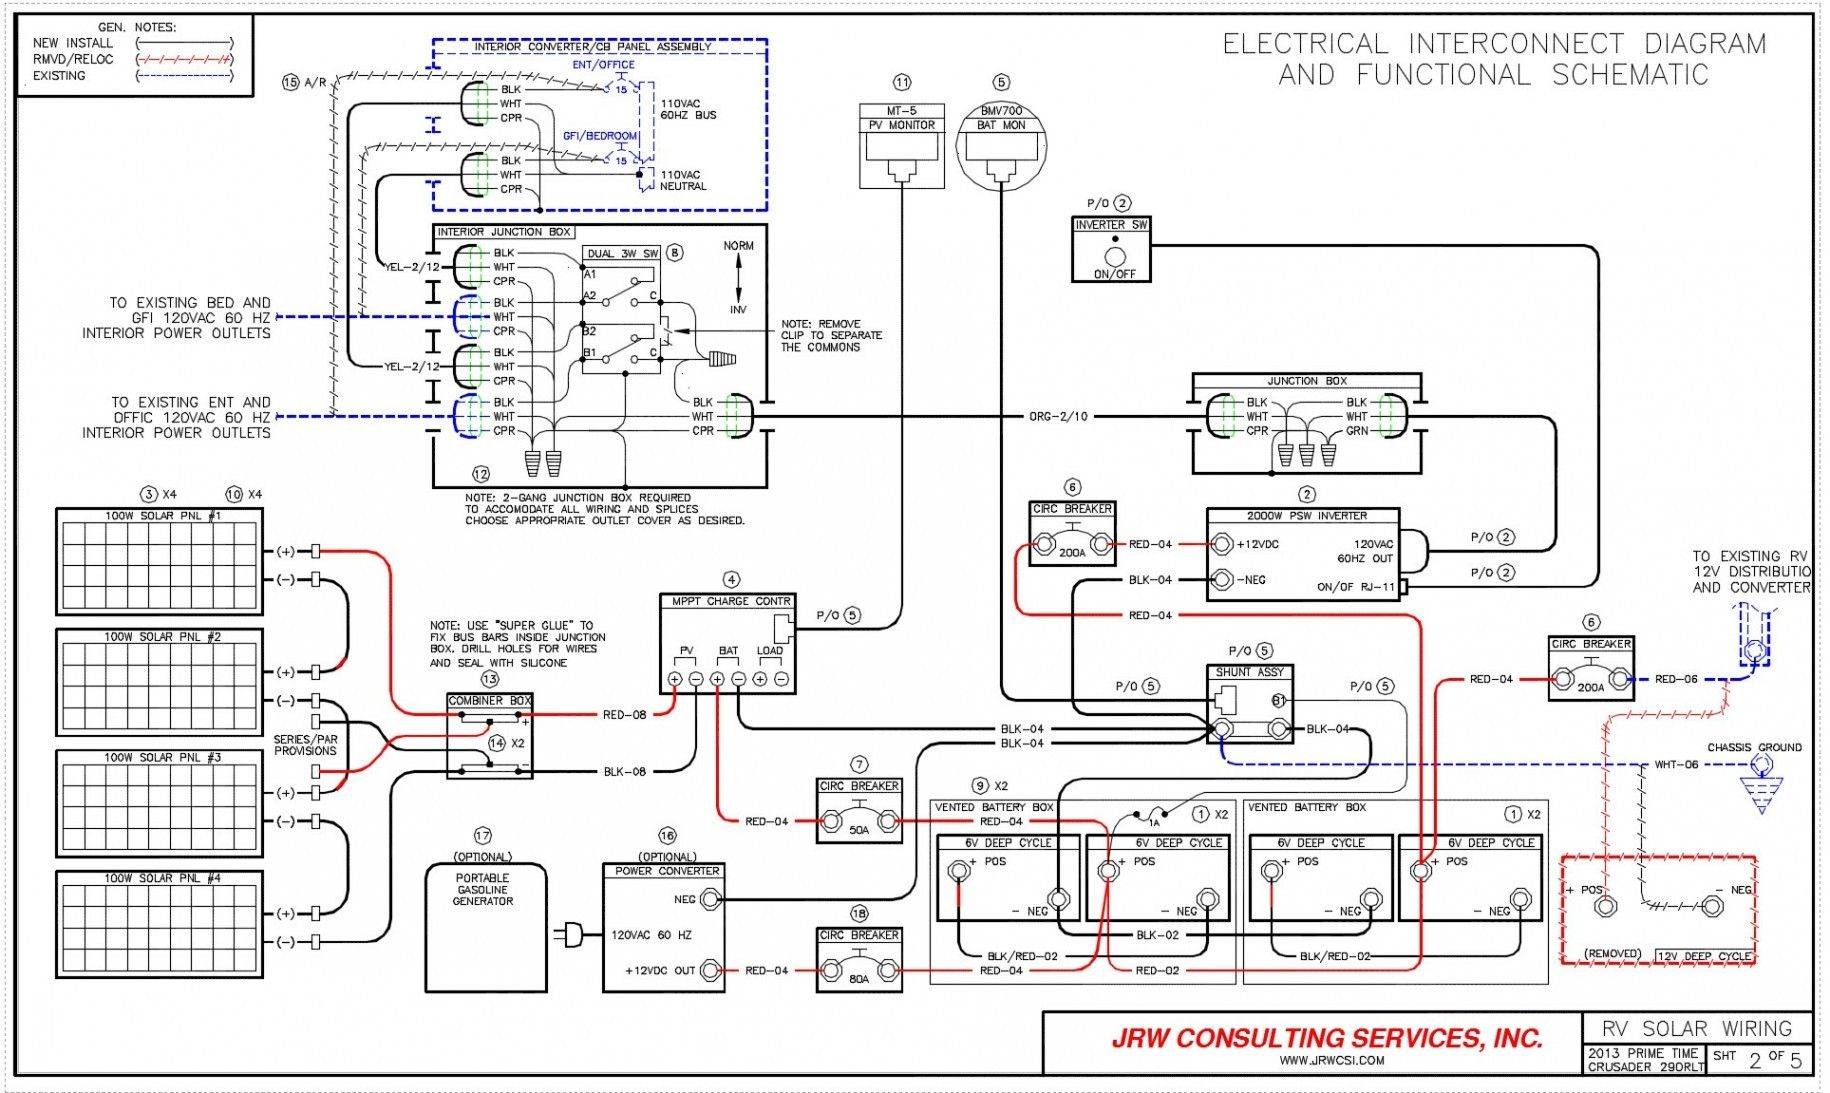 images?q=tbn:ANd9GcQh_l3eQ5xwiPy07kGEXjmjgmBKBRB7H2mRxCGhv1tFWg5c_mWT Wiring Rv Fuse Panel Diagram